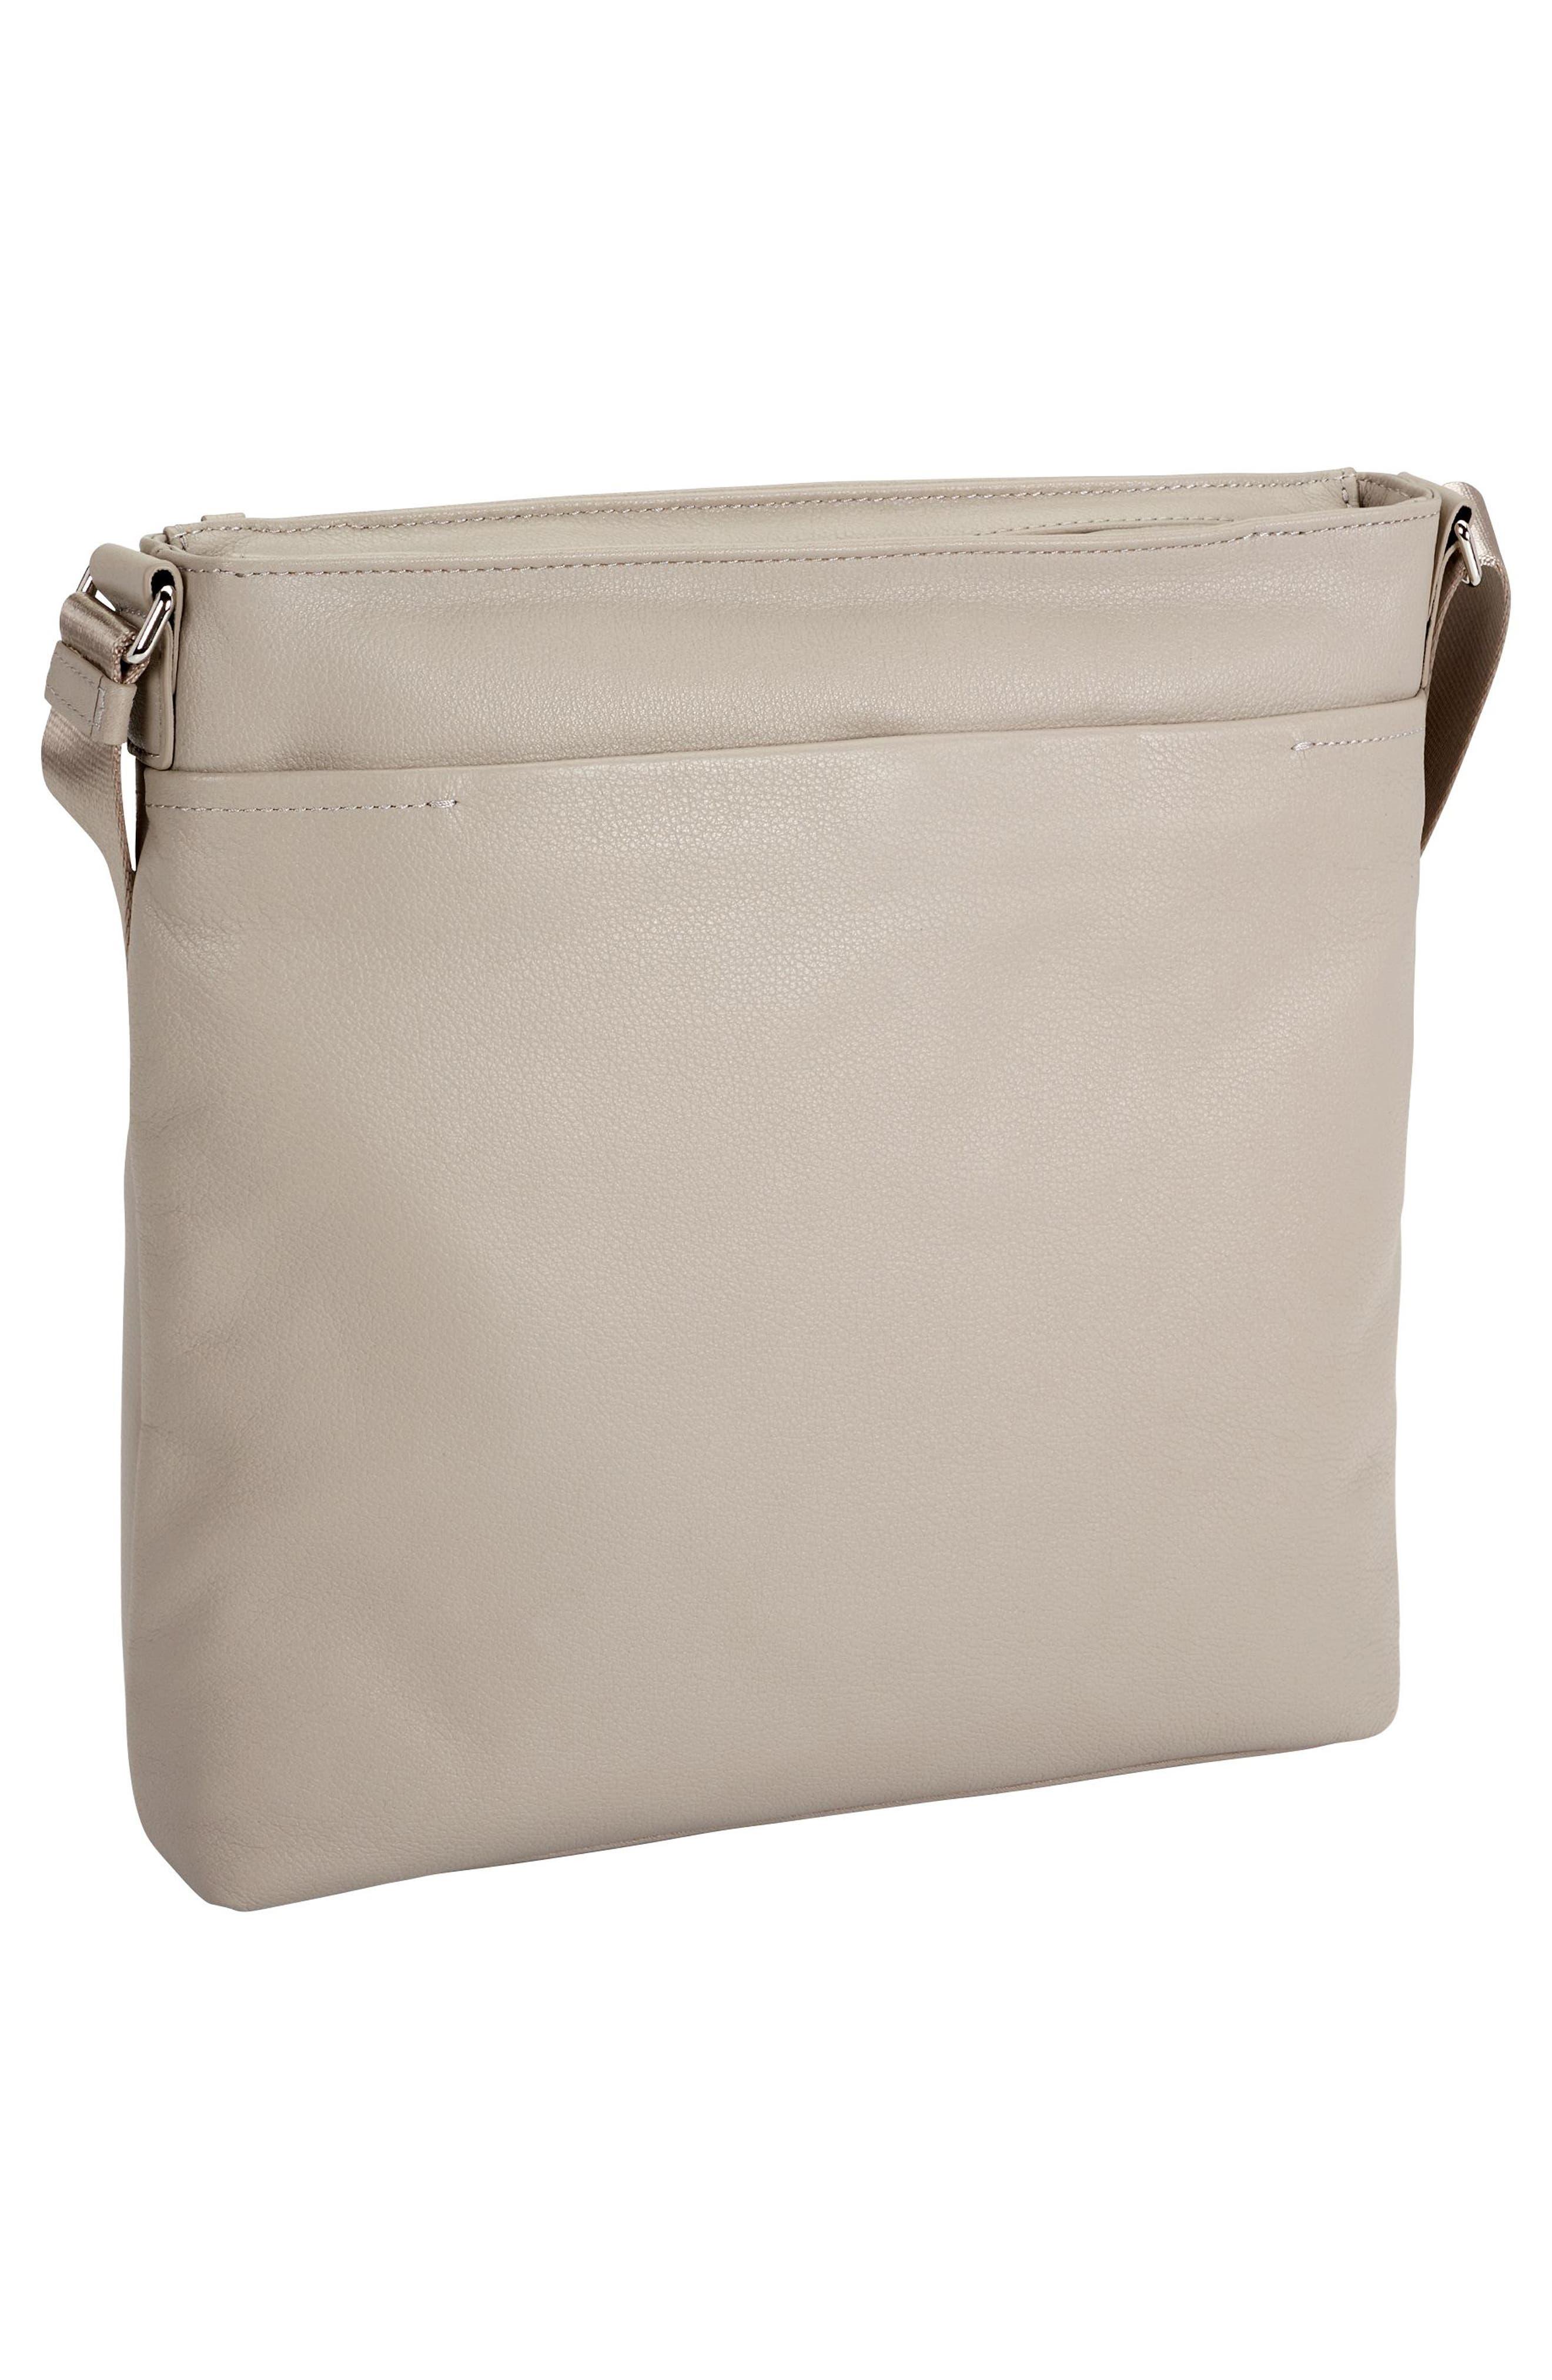 Voyageur - Capri Leather Crossbody Bag,                             Alternate thumbnail 9, color,